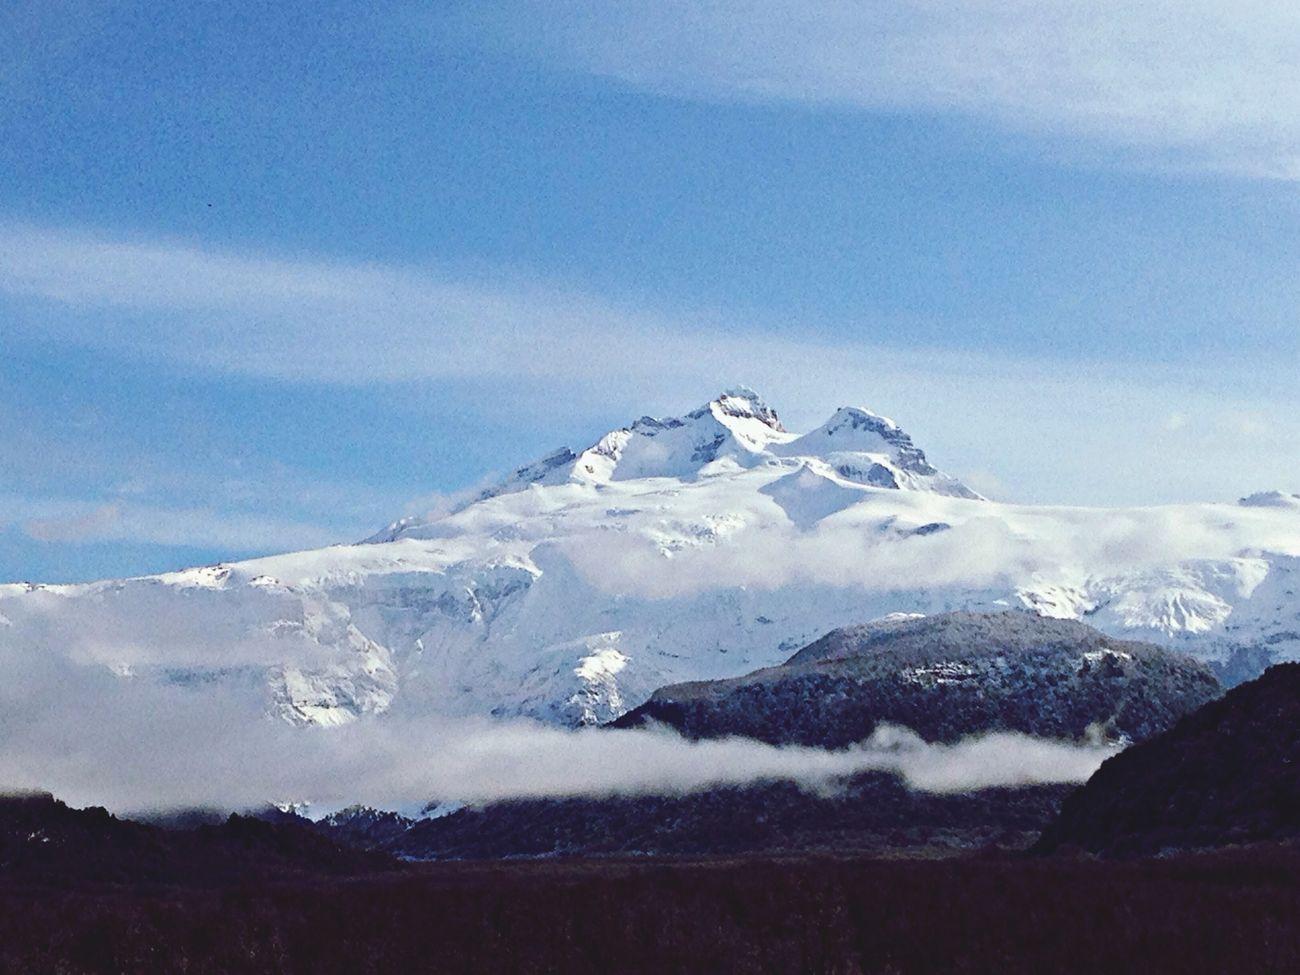 Cerro Tronador Mountains Snow Nature